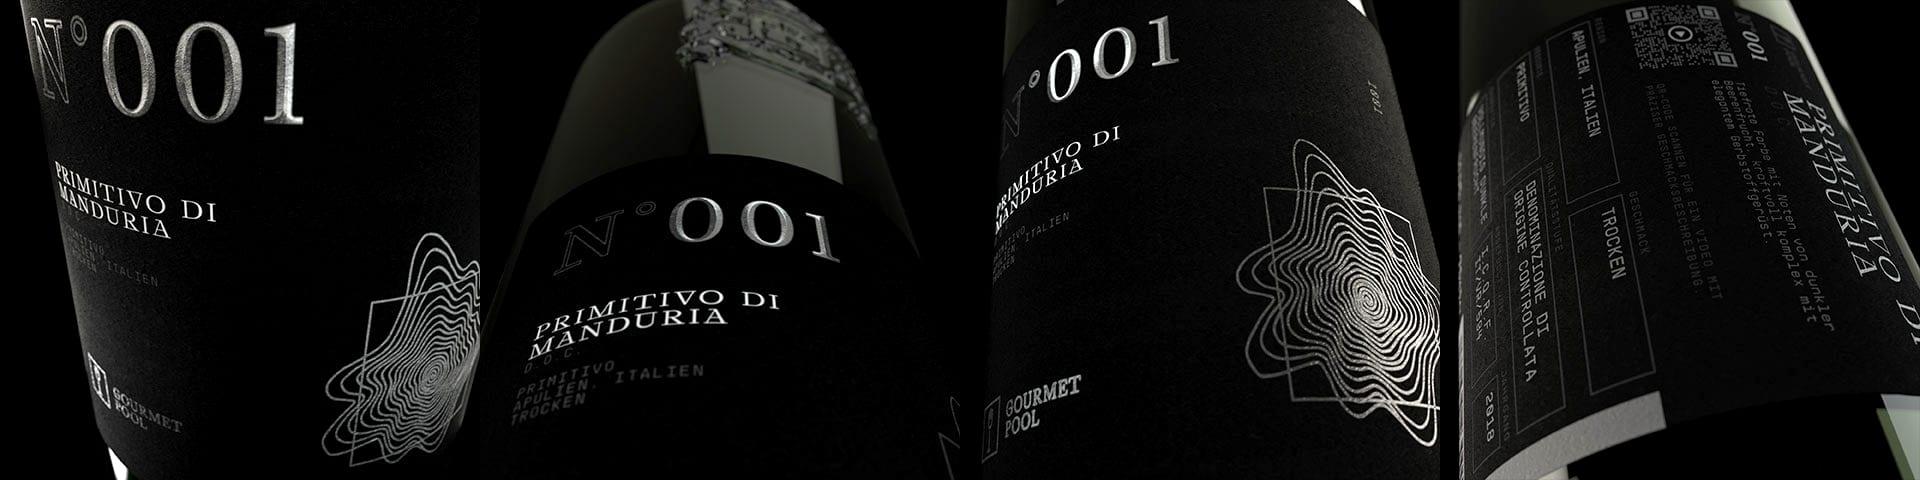 Weinflaschen Detailaufnahme N°001 Primitivo di Manduria